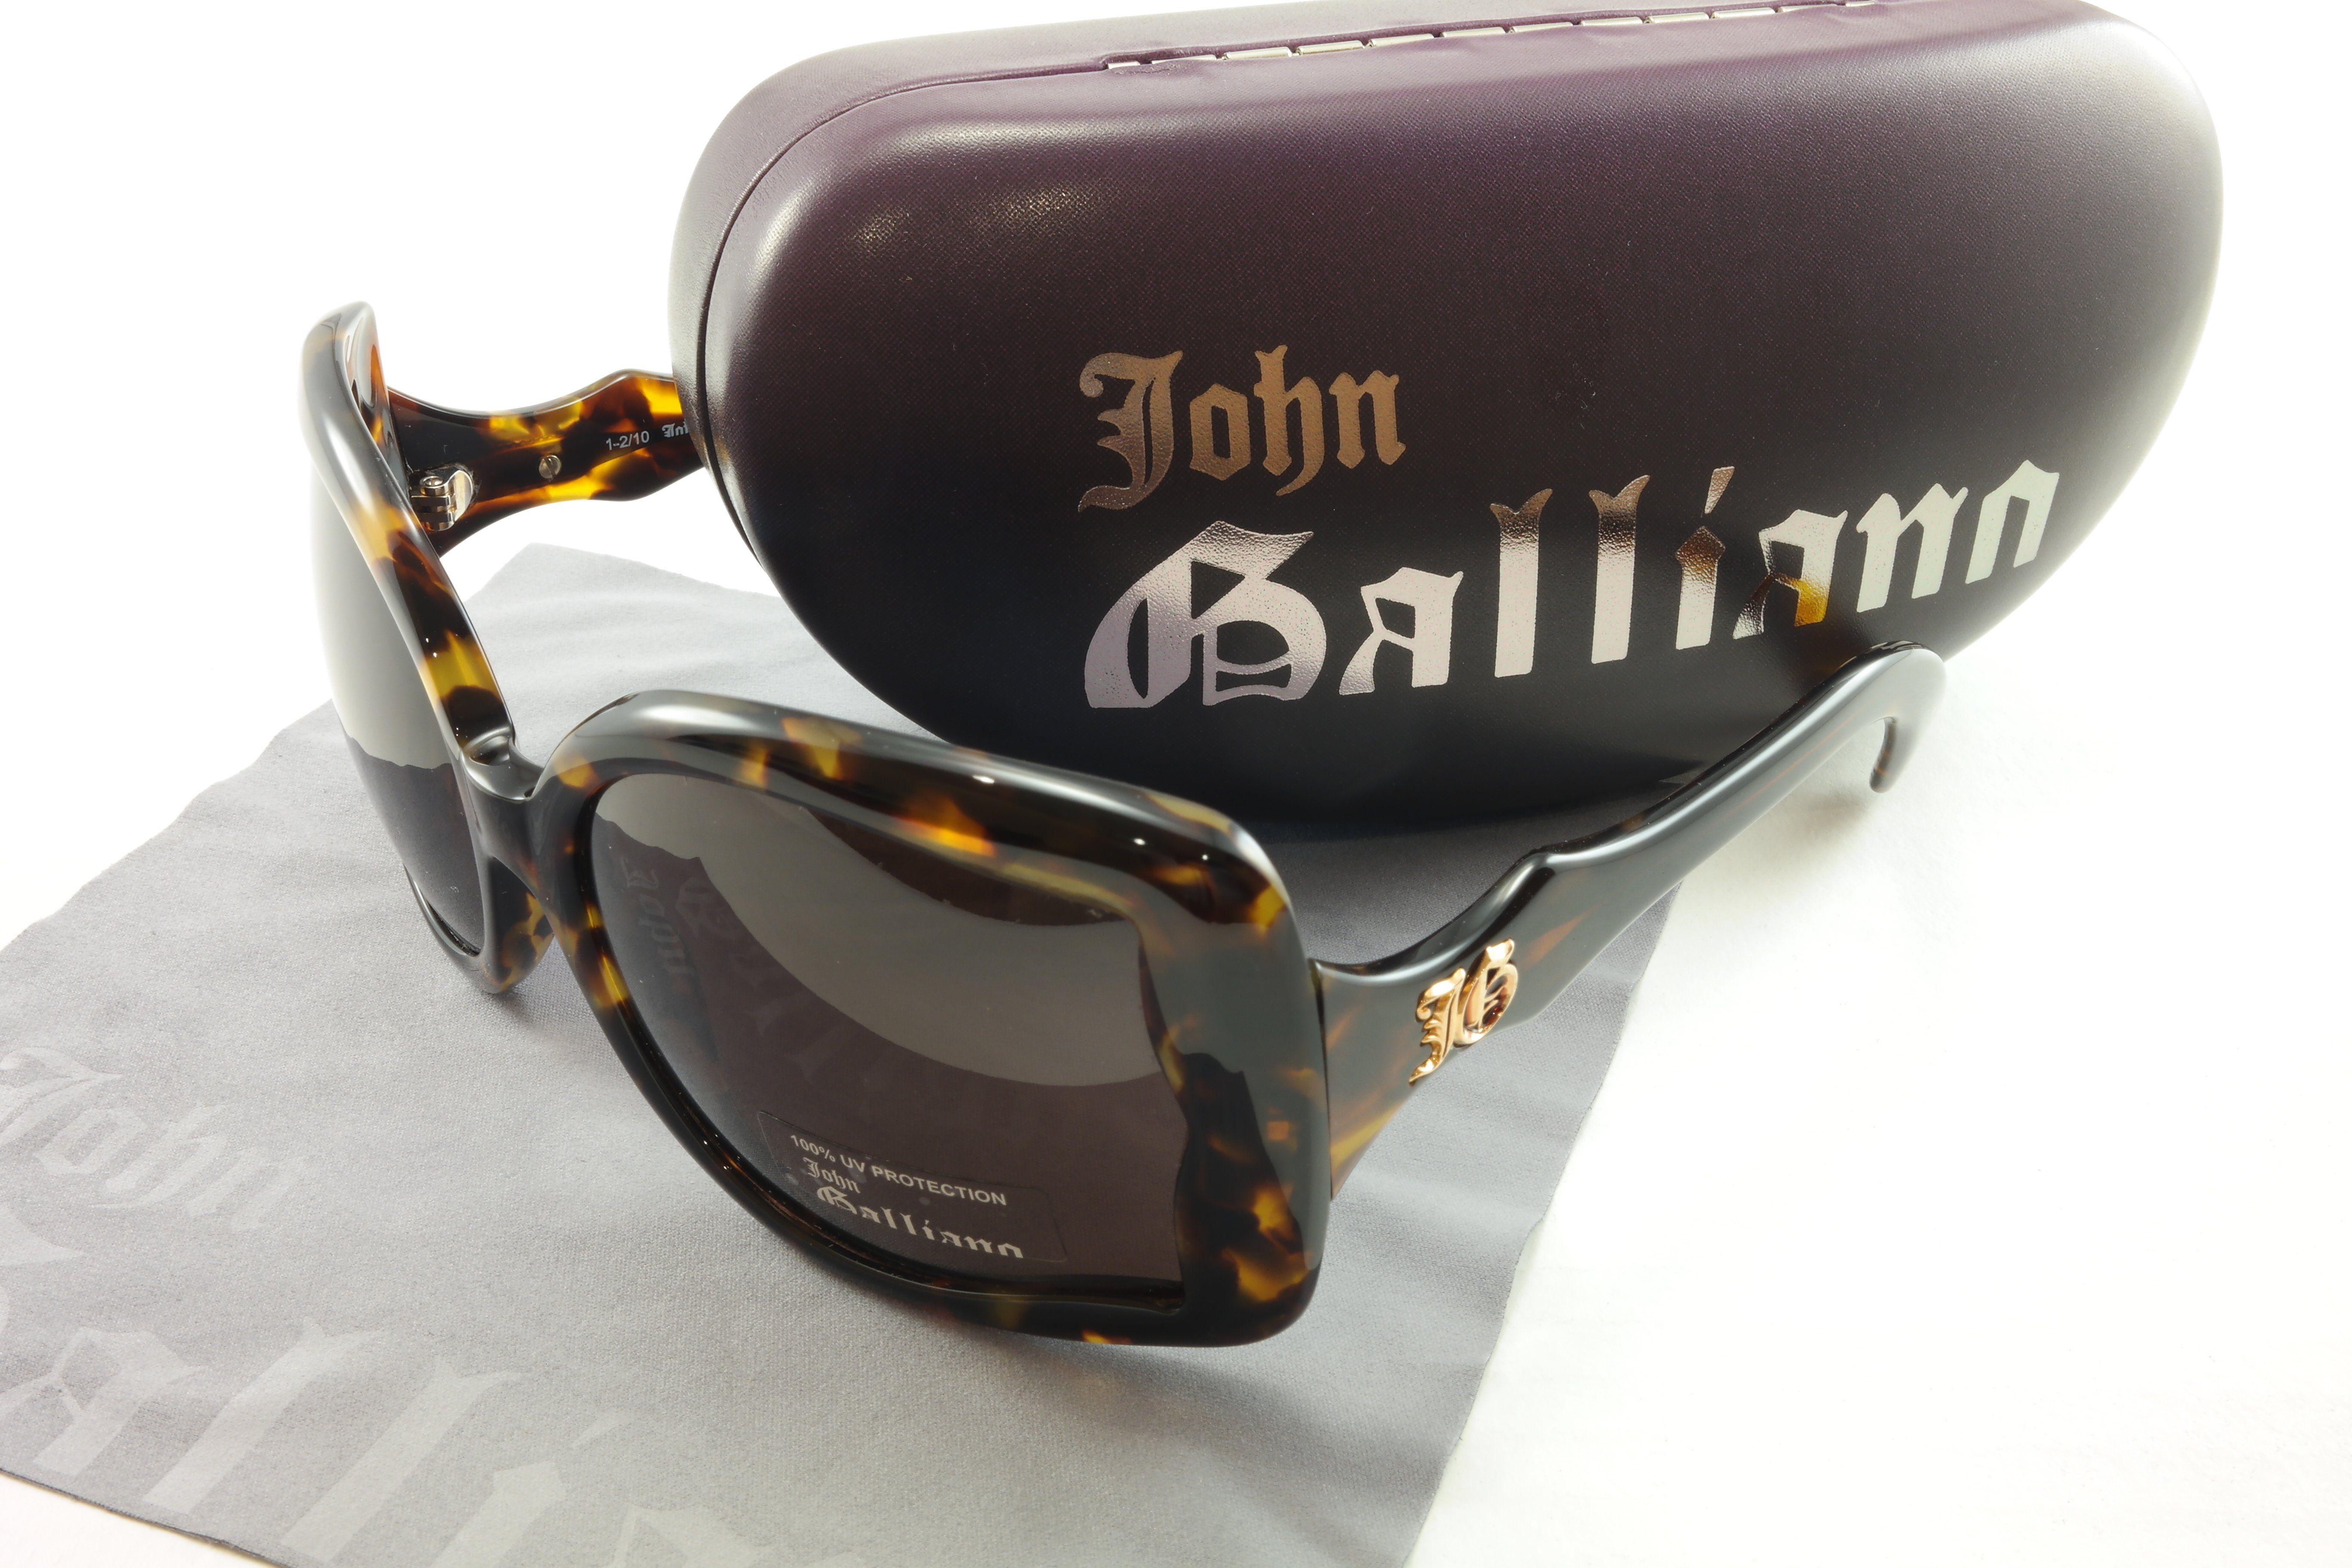 eaacd8fc310 John Galliano Sunglasses Frame JG06 53E Acetate Tortoise Italy in ...